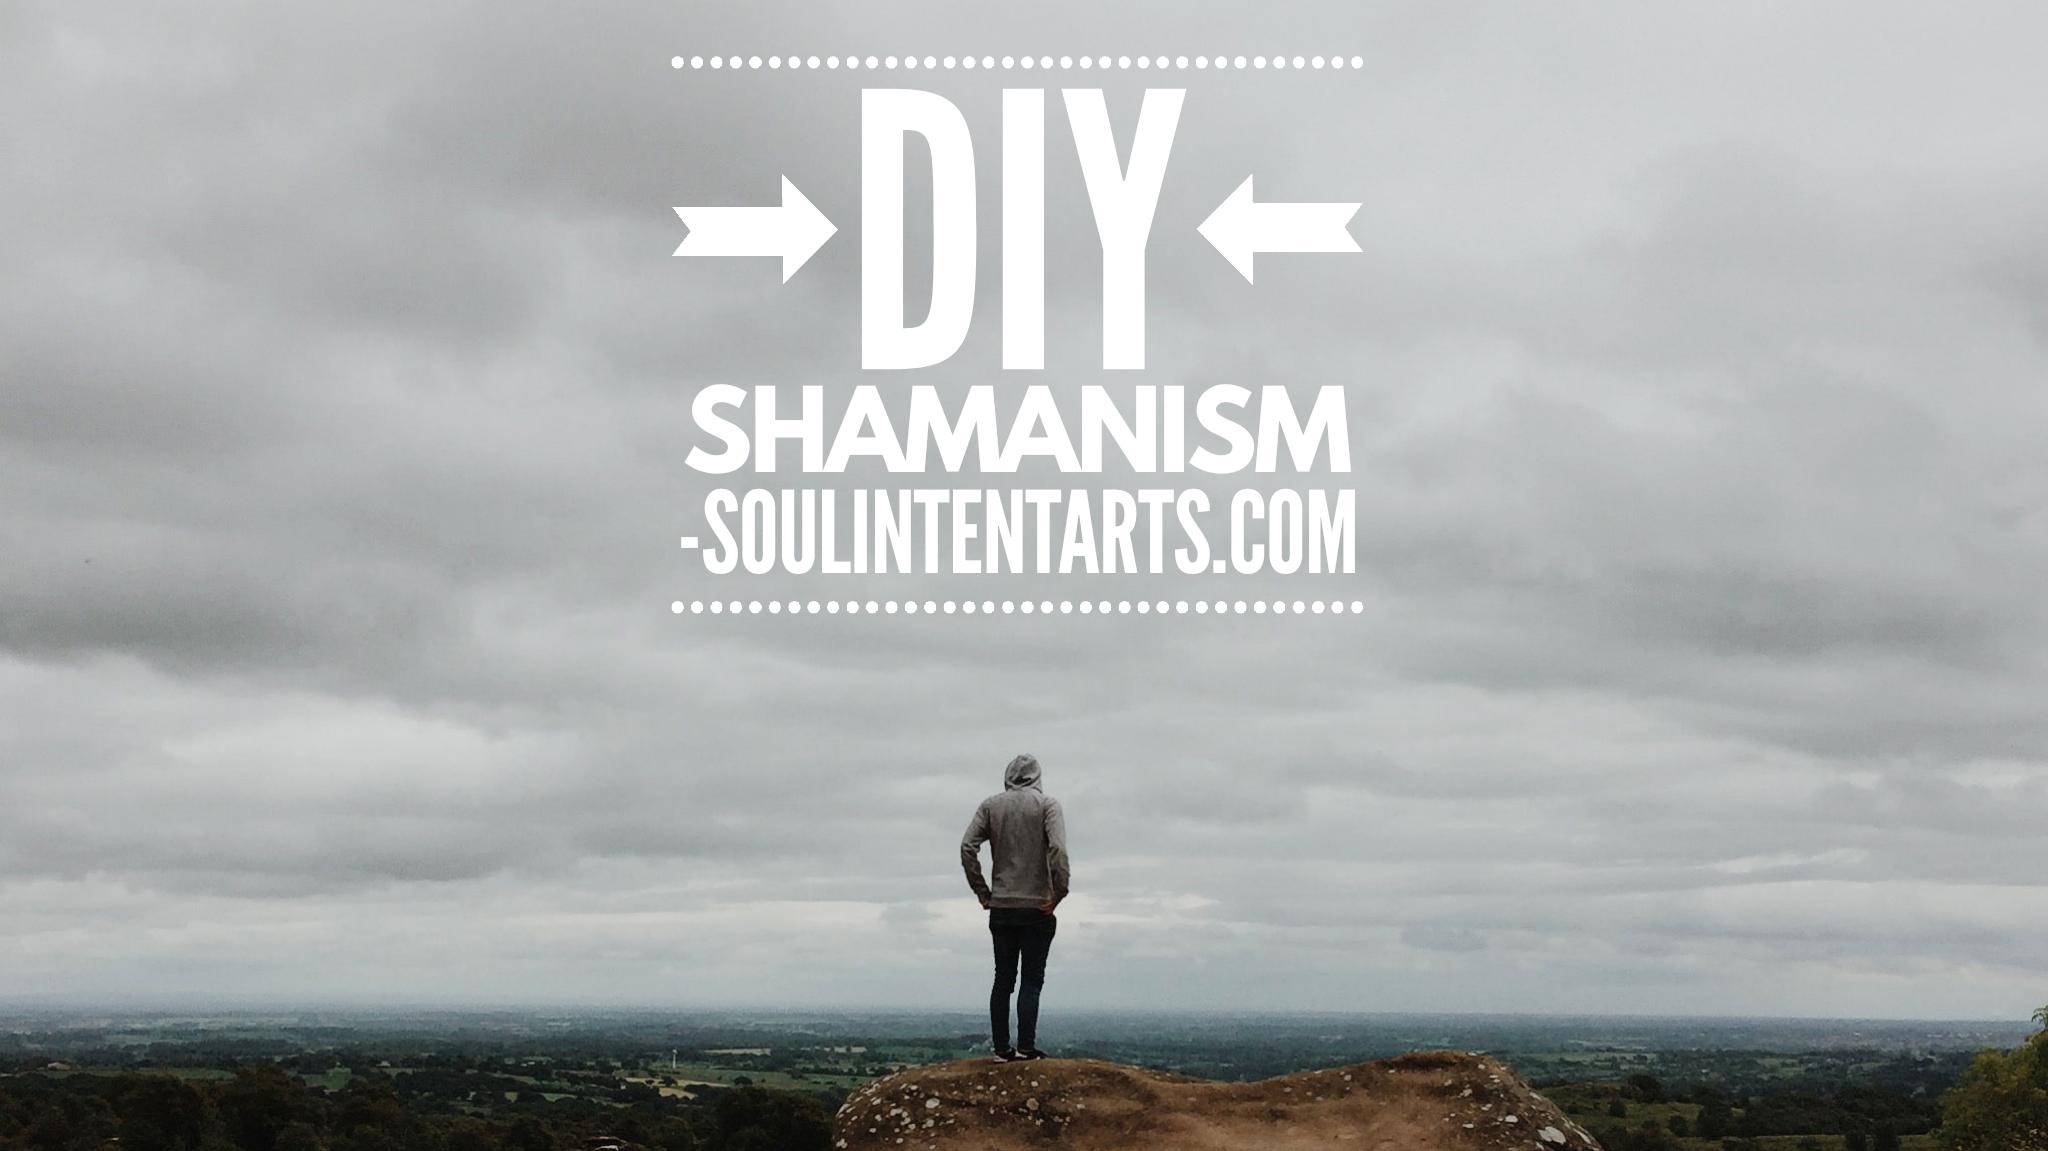 My Response to DIY Shamanism